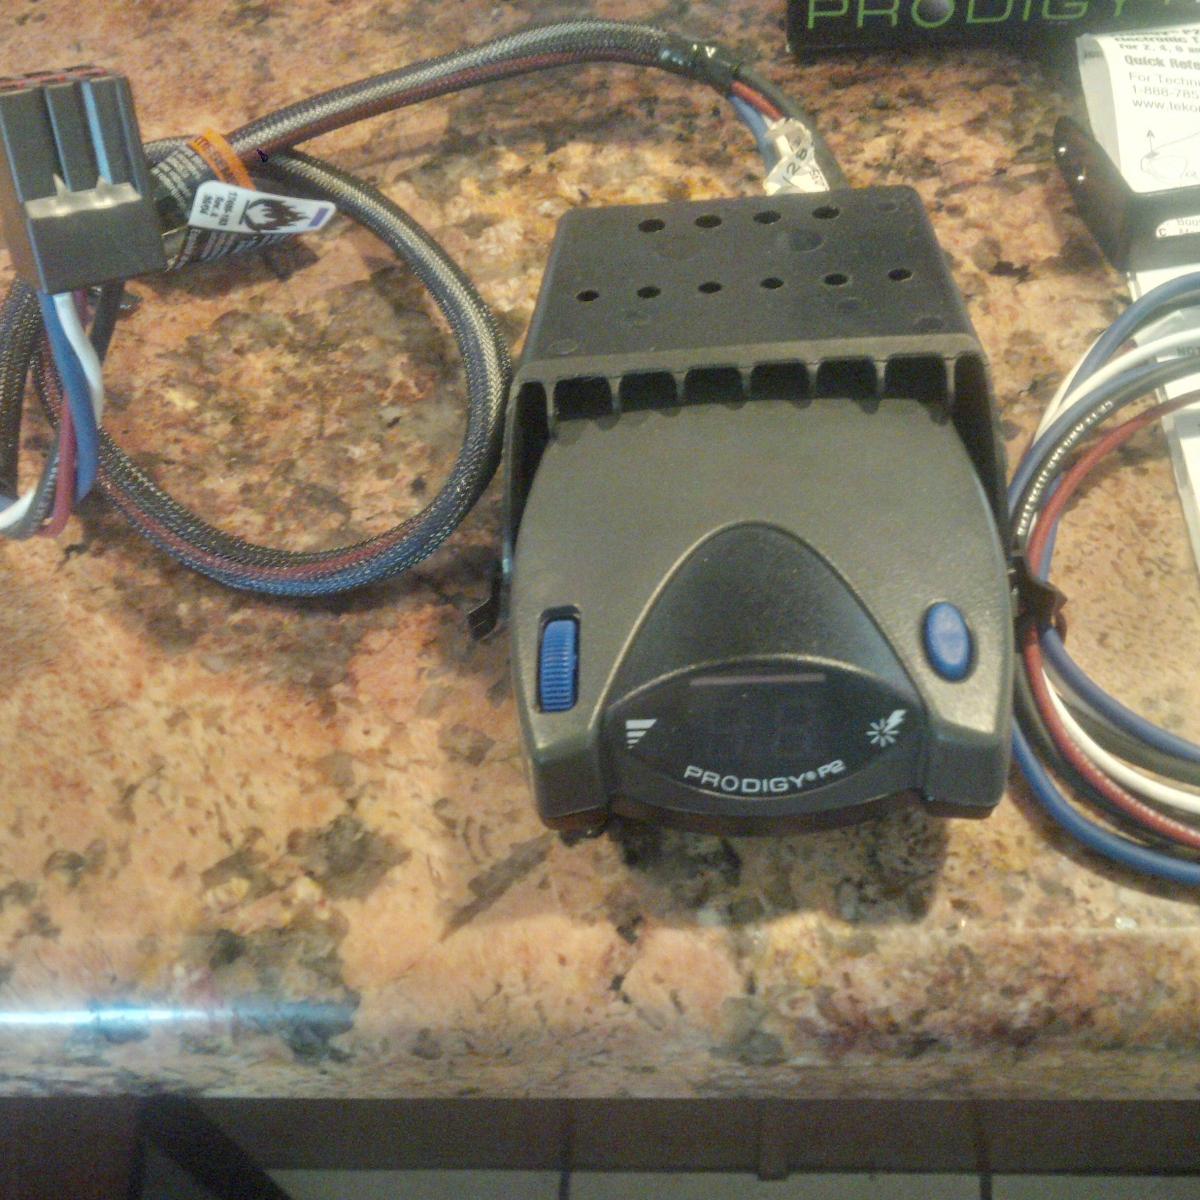 prodigy brake genie wiring diagram p2 trailer controller classified ads